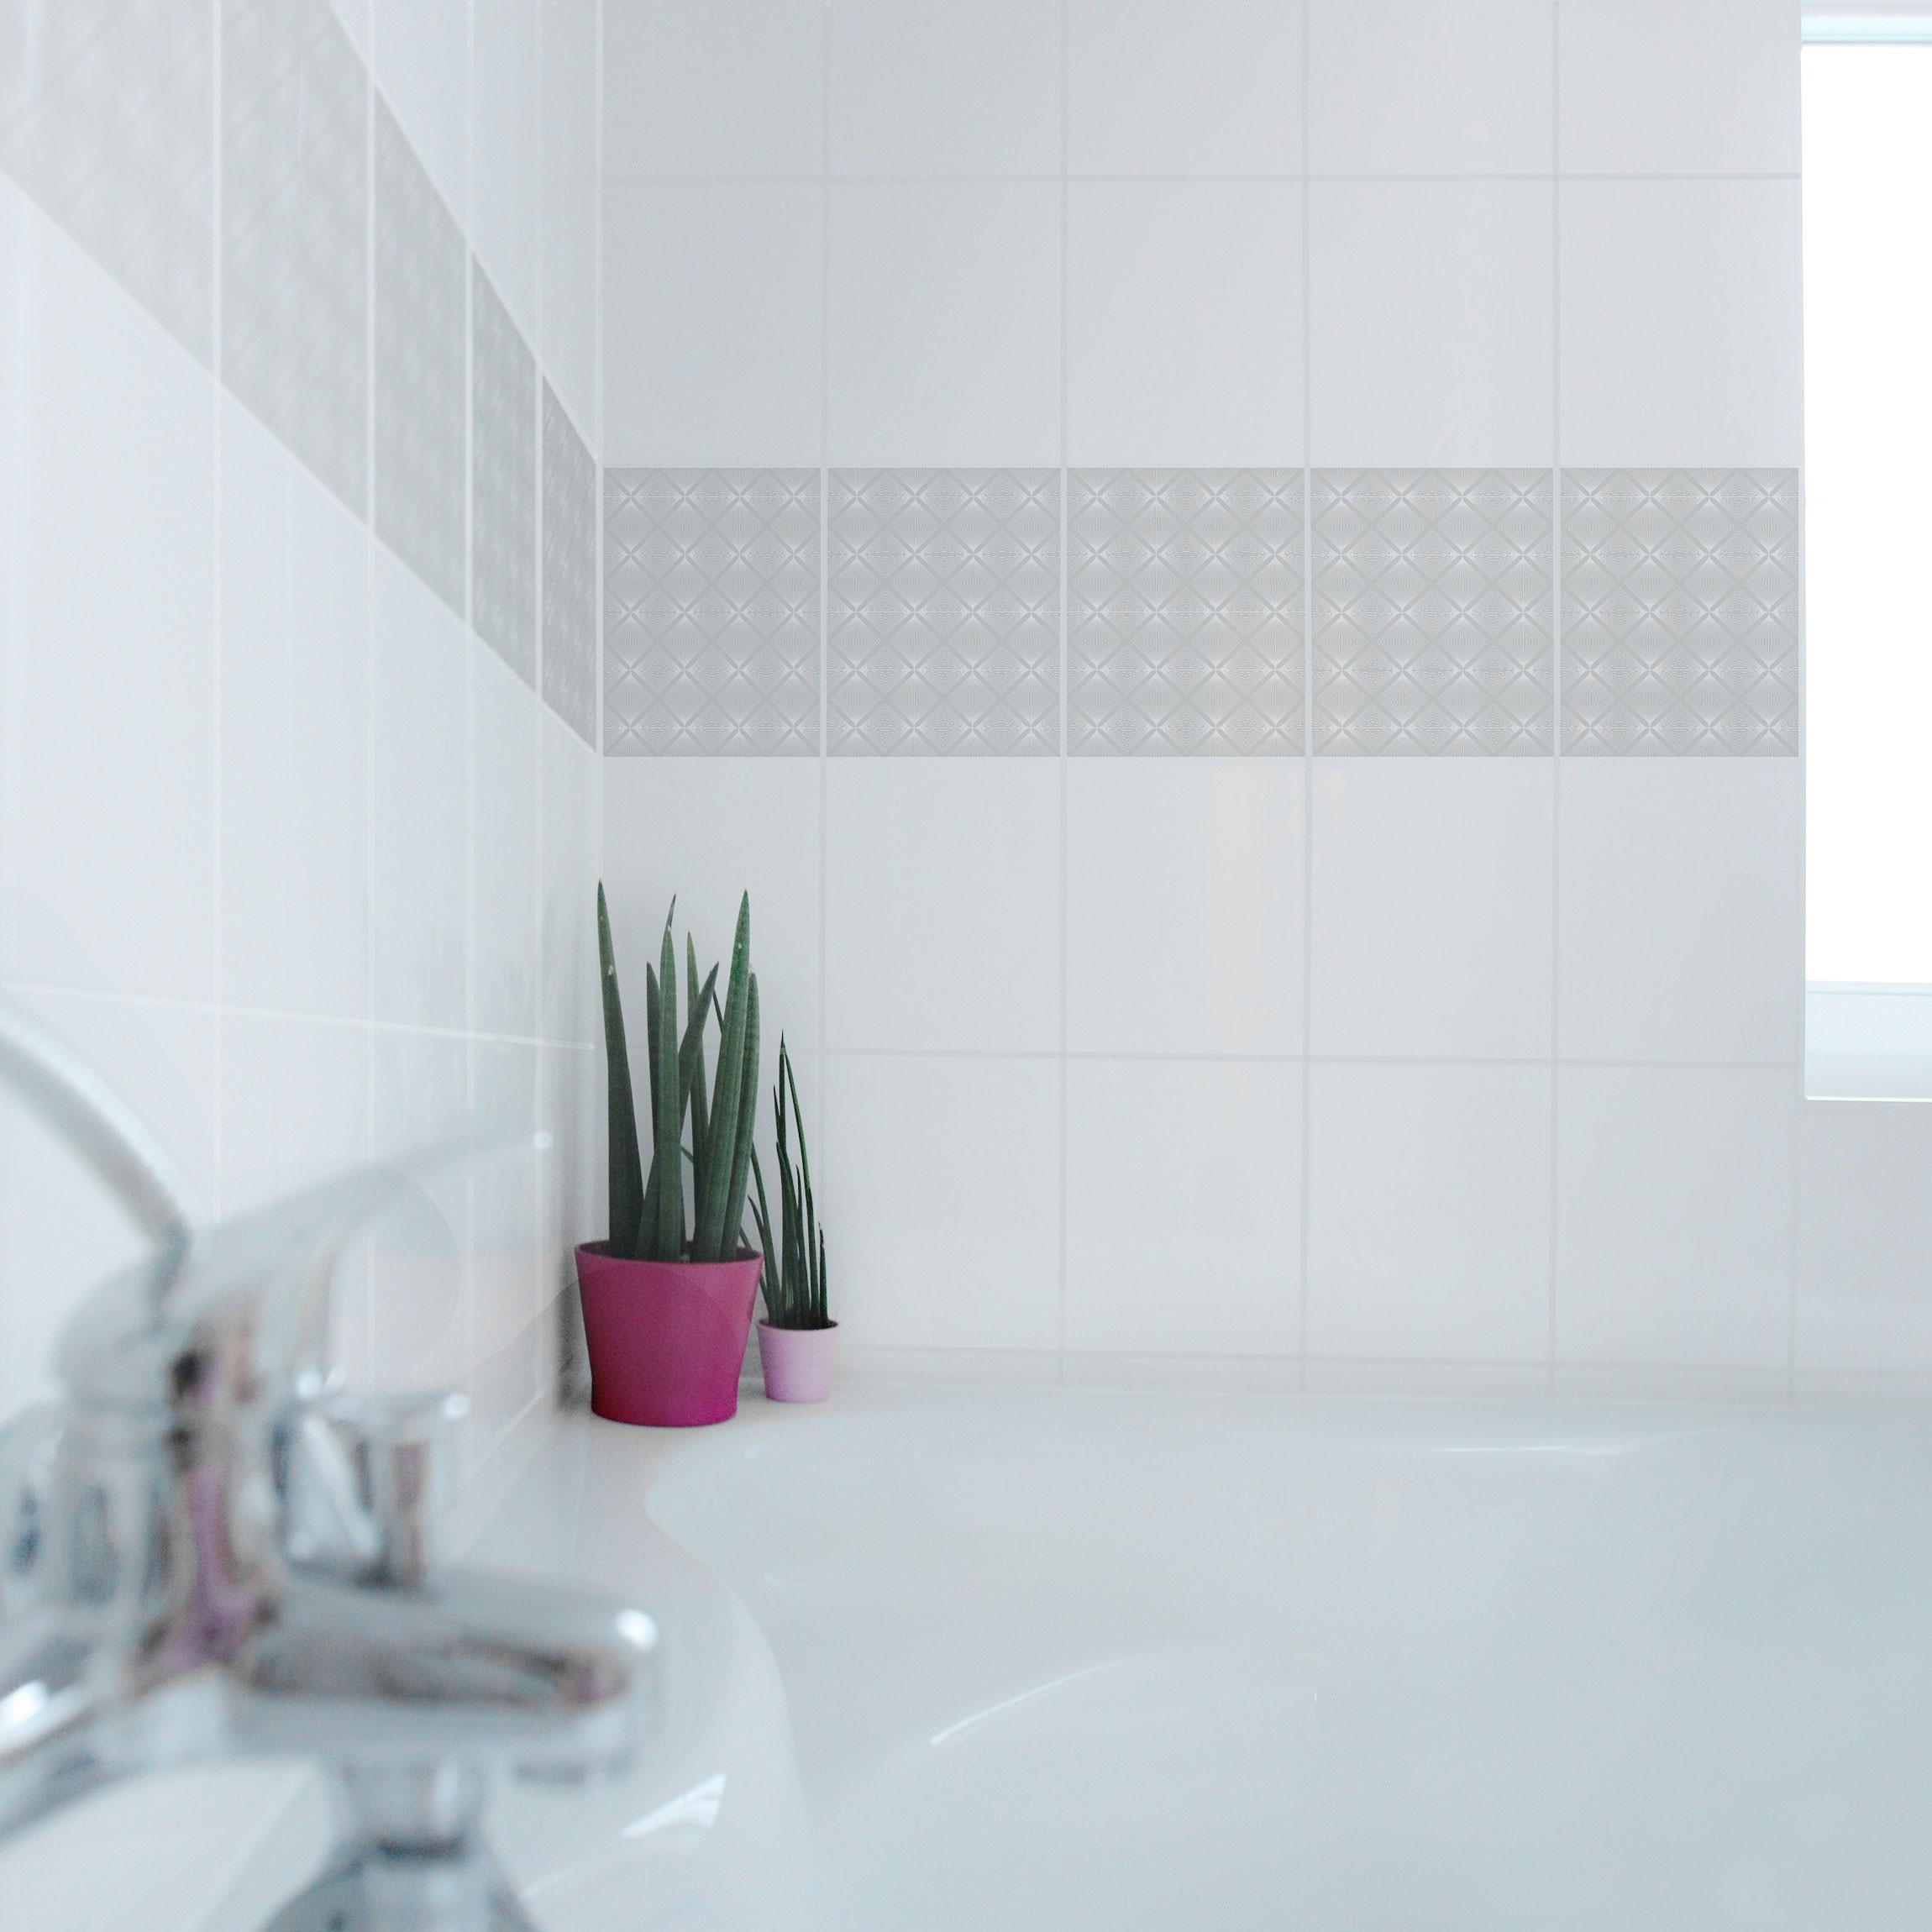 fliesen bord re zartes vintage caro light grey 25x20 cm fliesenaufkleber grau. Black Bedroom Furniture Sets. Home Design Ideas